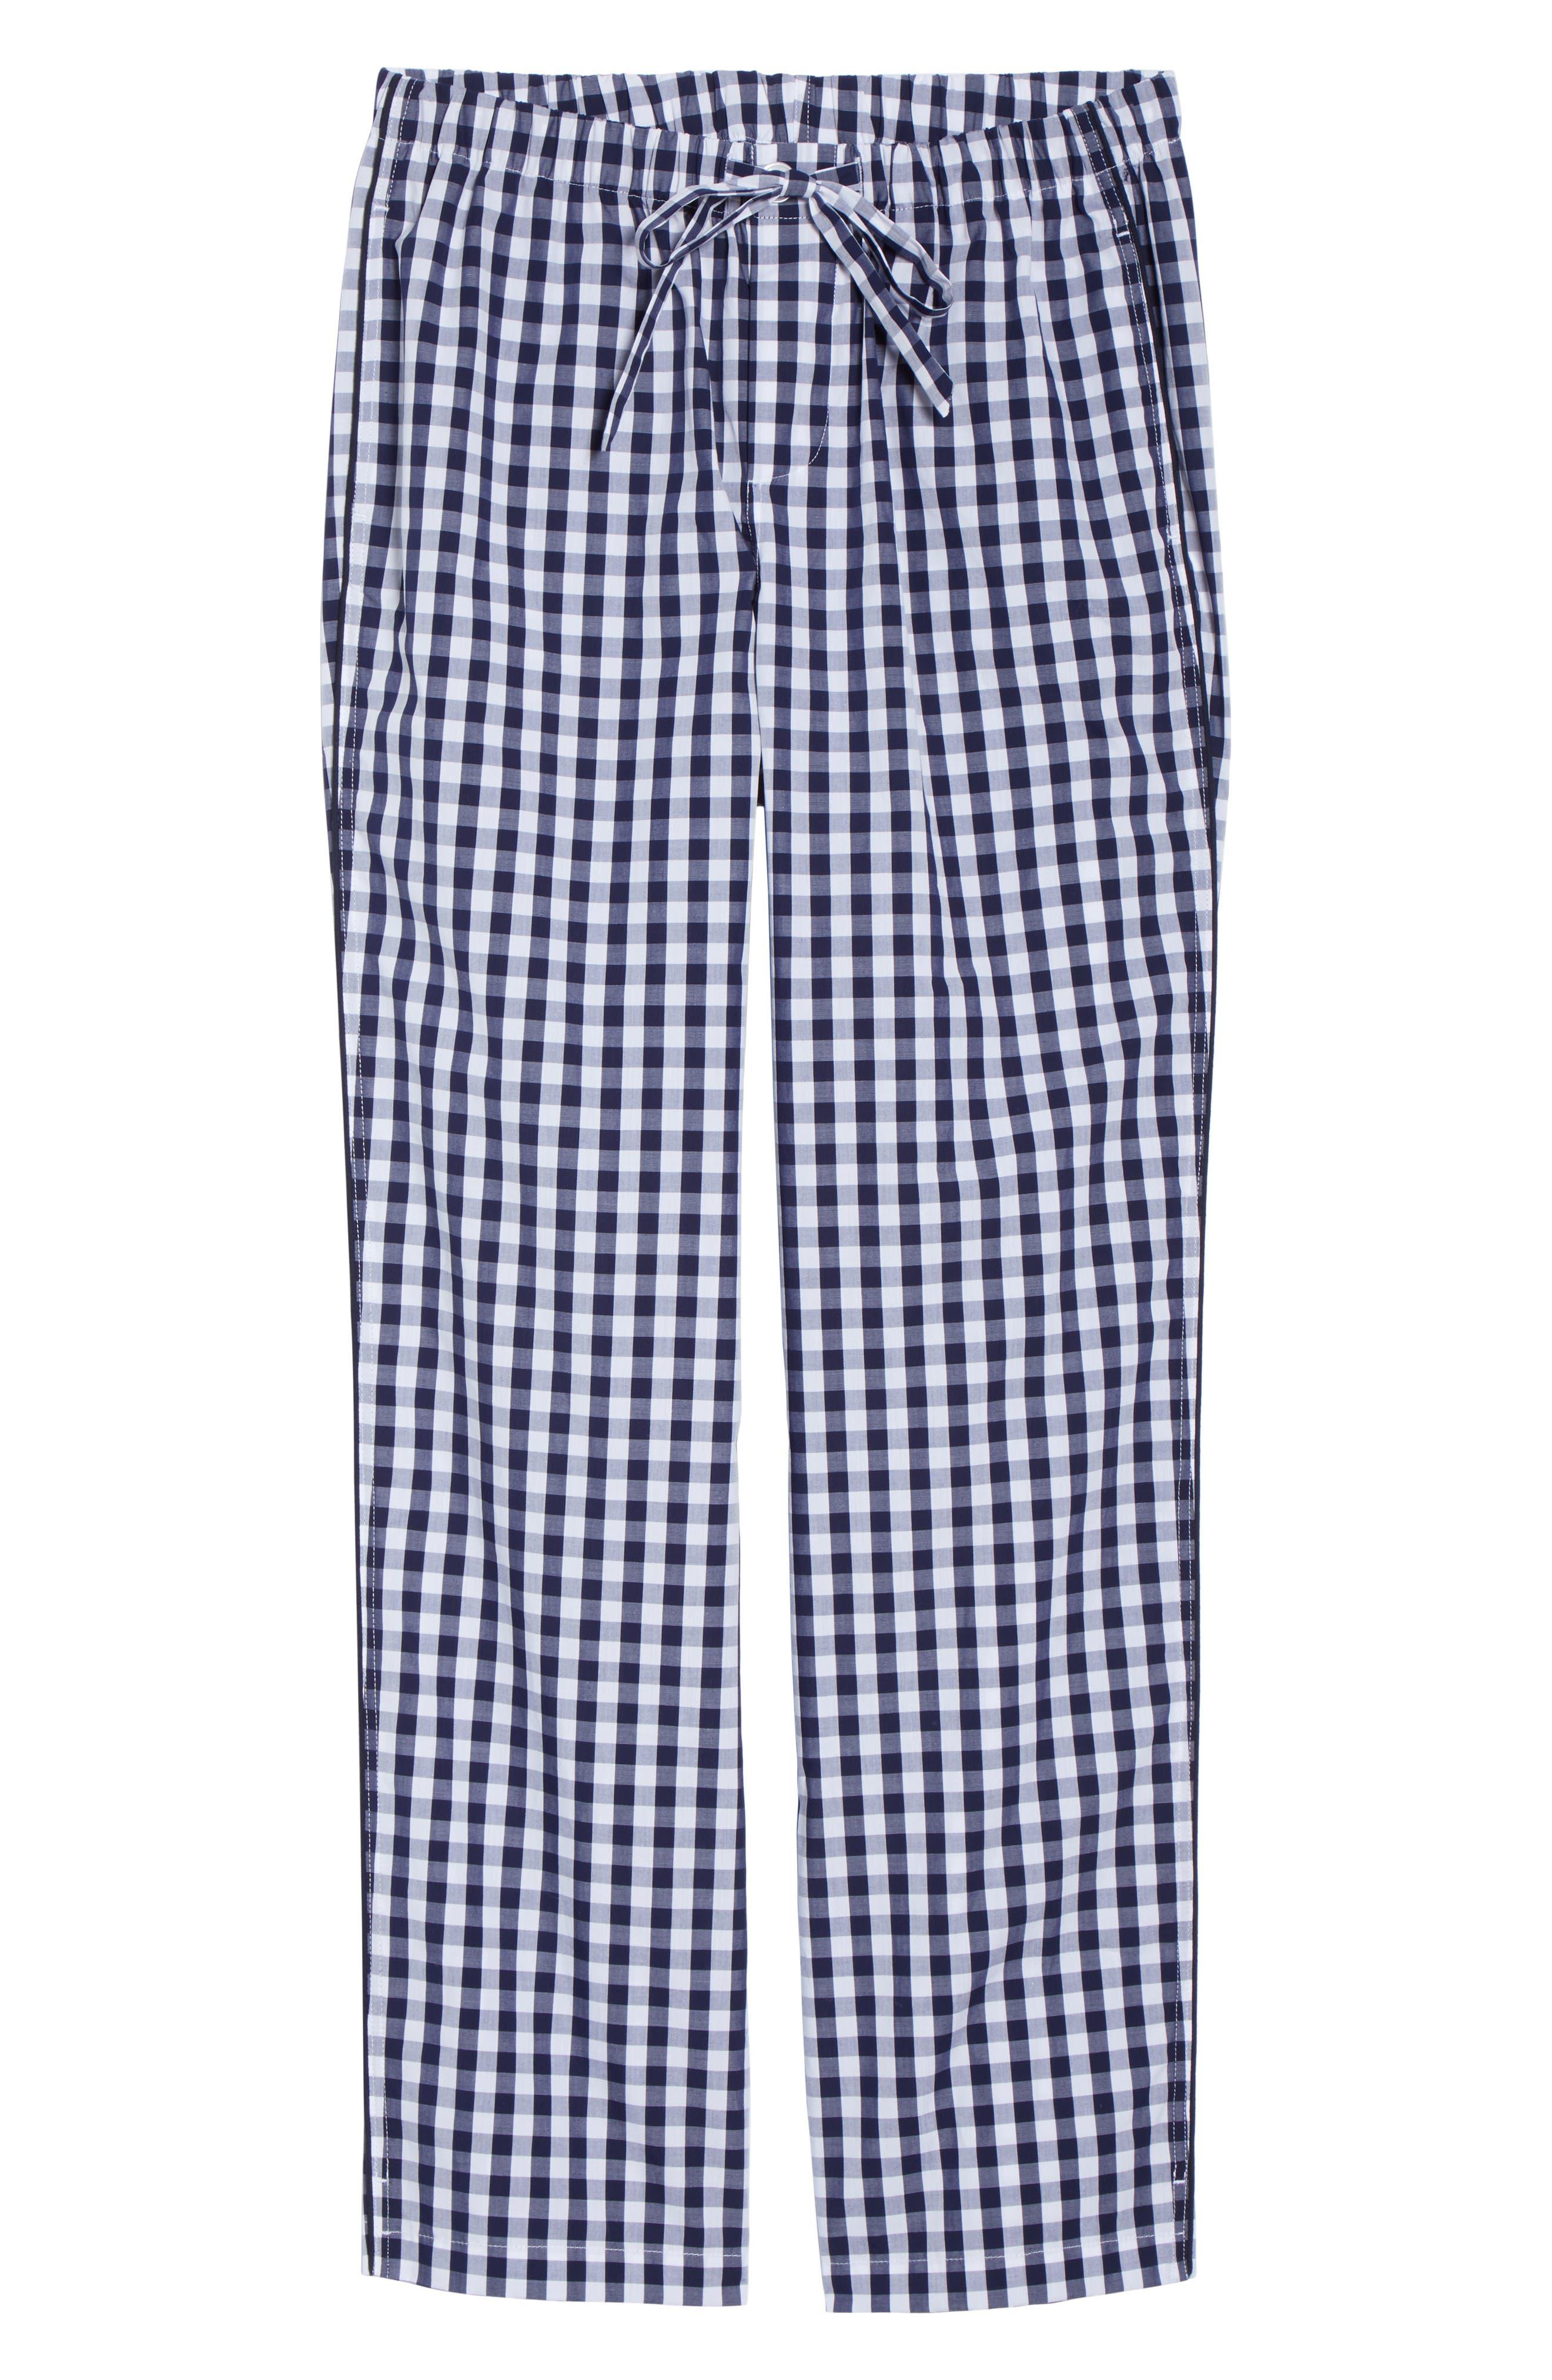 Marina Women's Pajama Pants,                         Main,                         color, LARGE GINGHAM BLUE